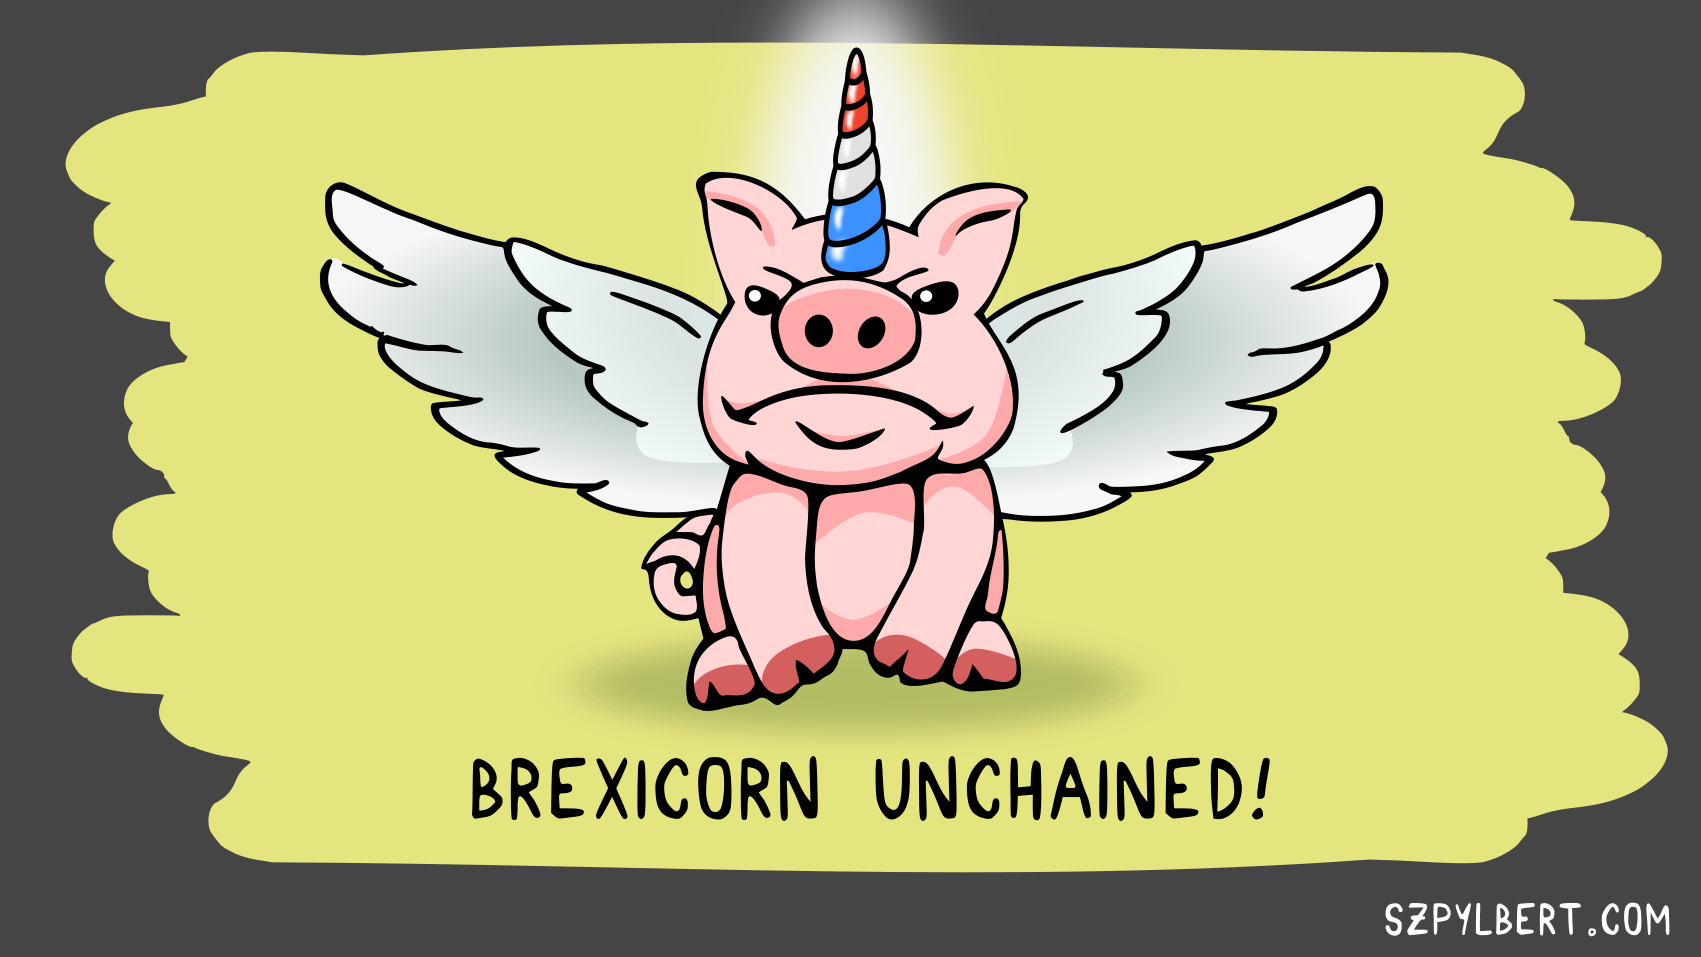 Brexicorn (c) Szpylbert 2020